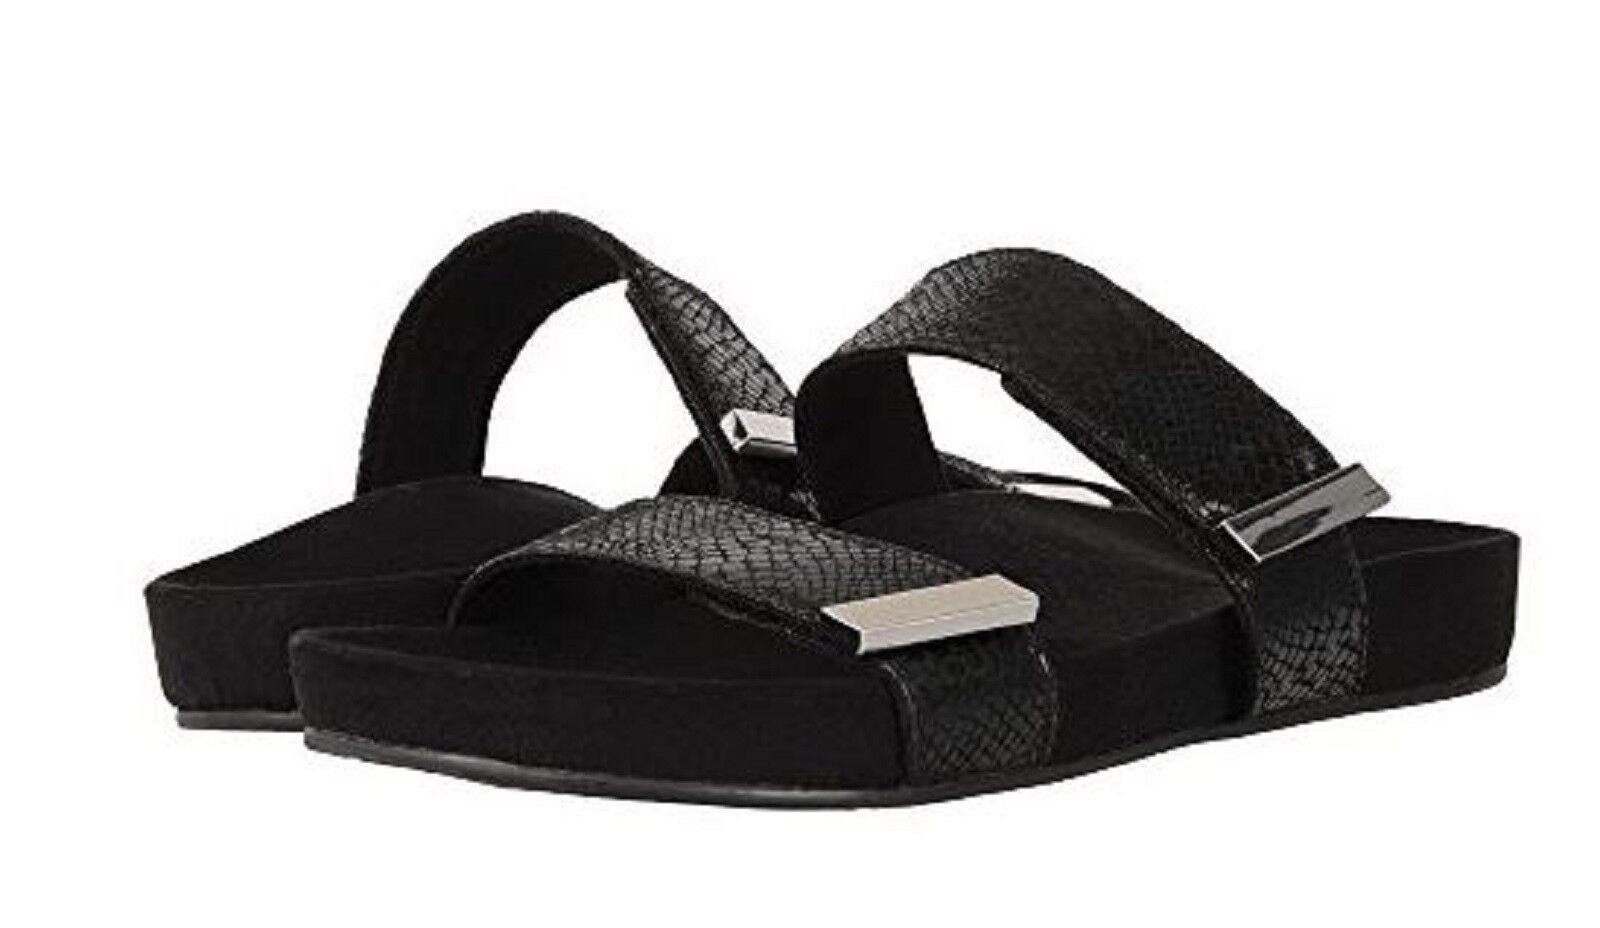 Vionic Orthaheel GRACE JURA Premium Leder Slide Sandales BLACK SNAKE 6.5 M NIB